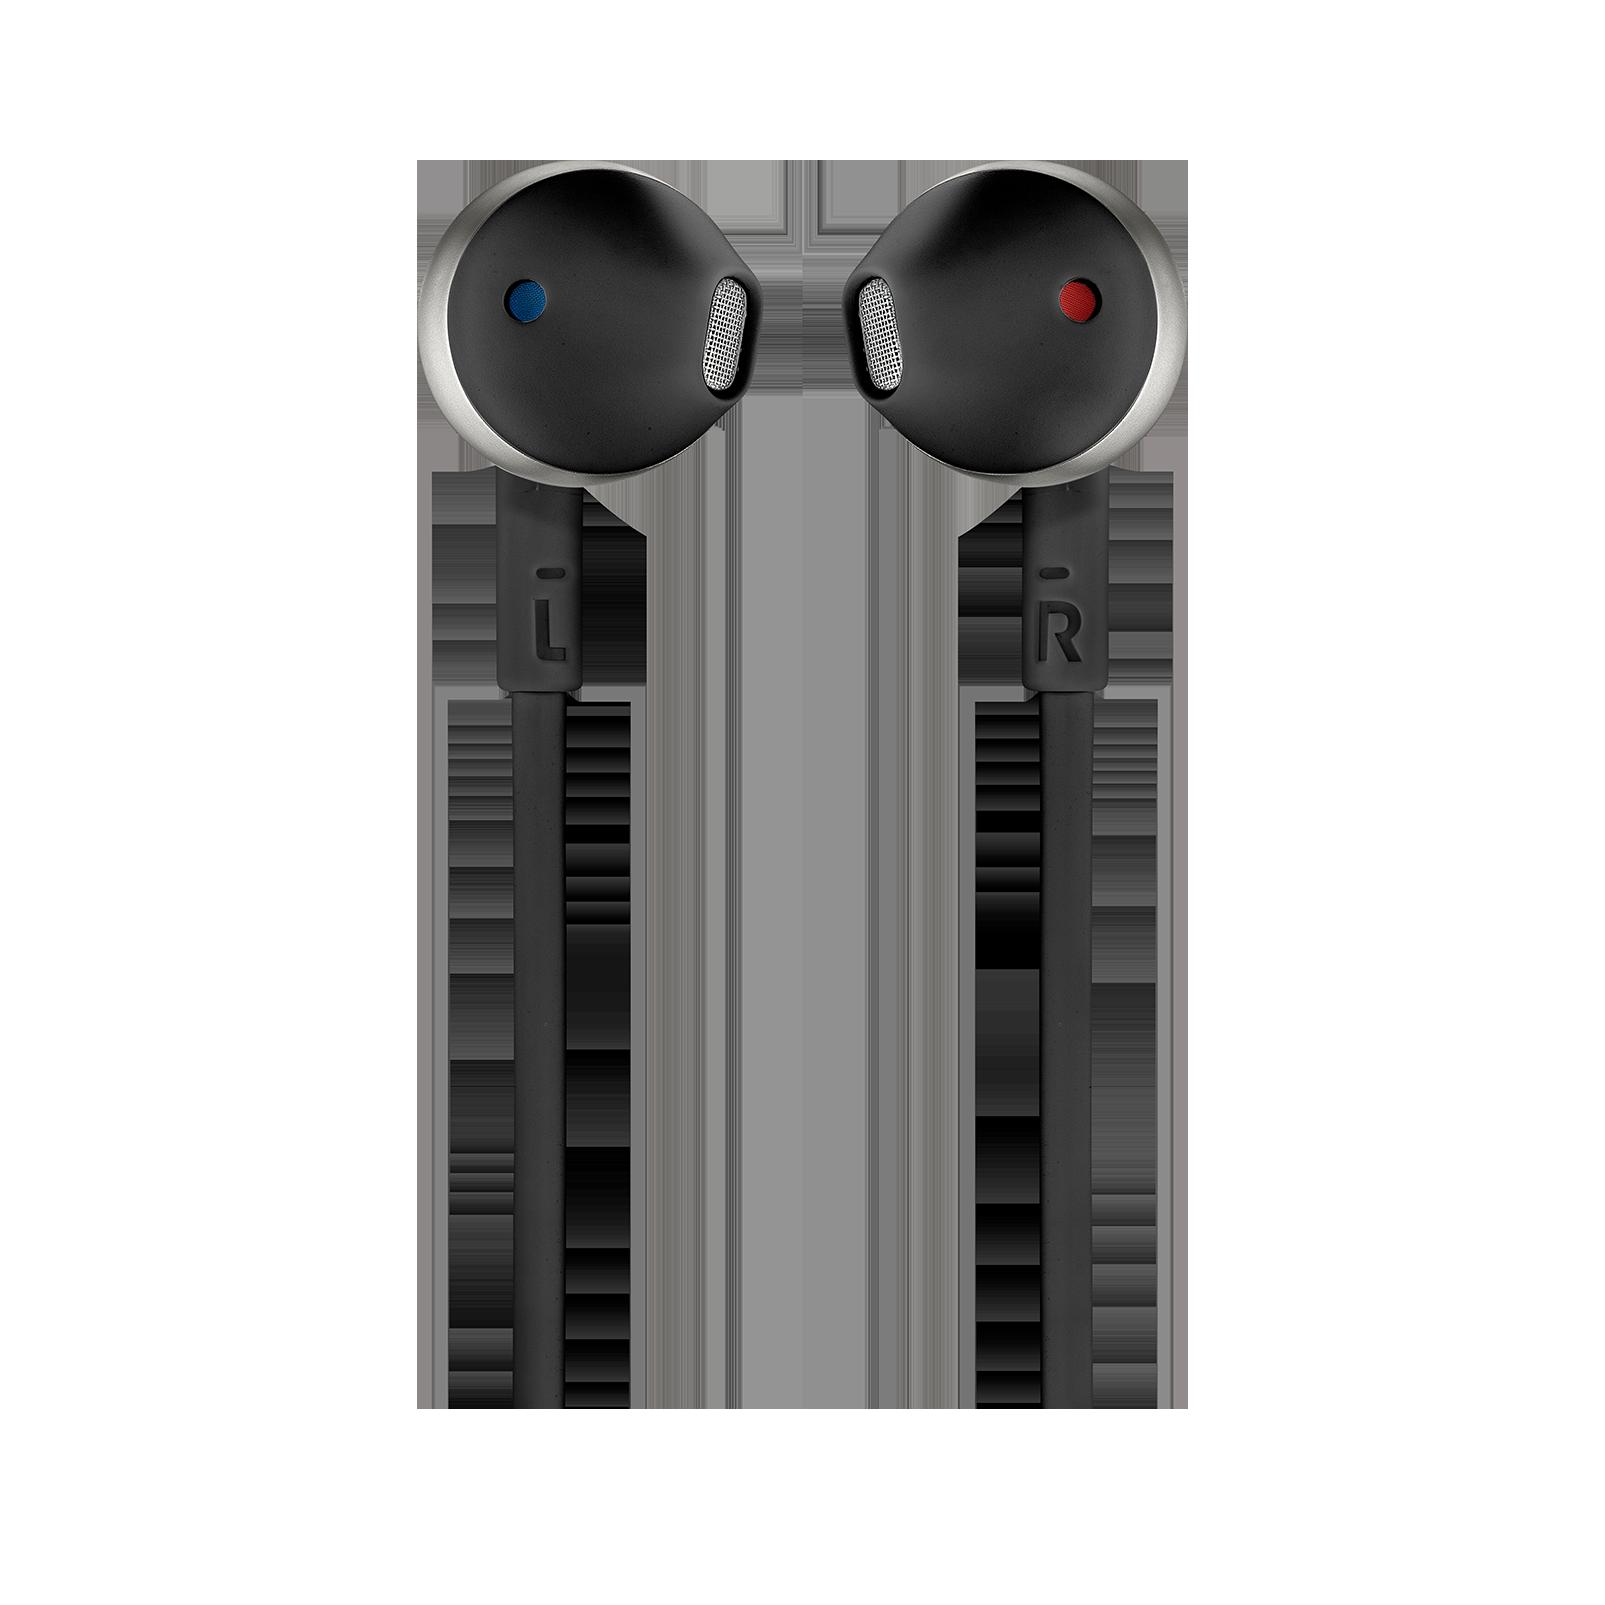 JBL TUNE 205BT - Black - Wireless Earbud headphones - Front